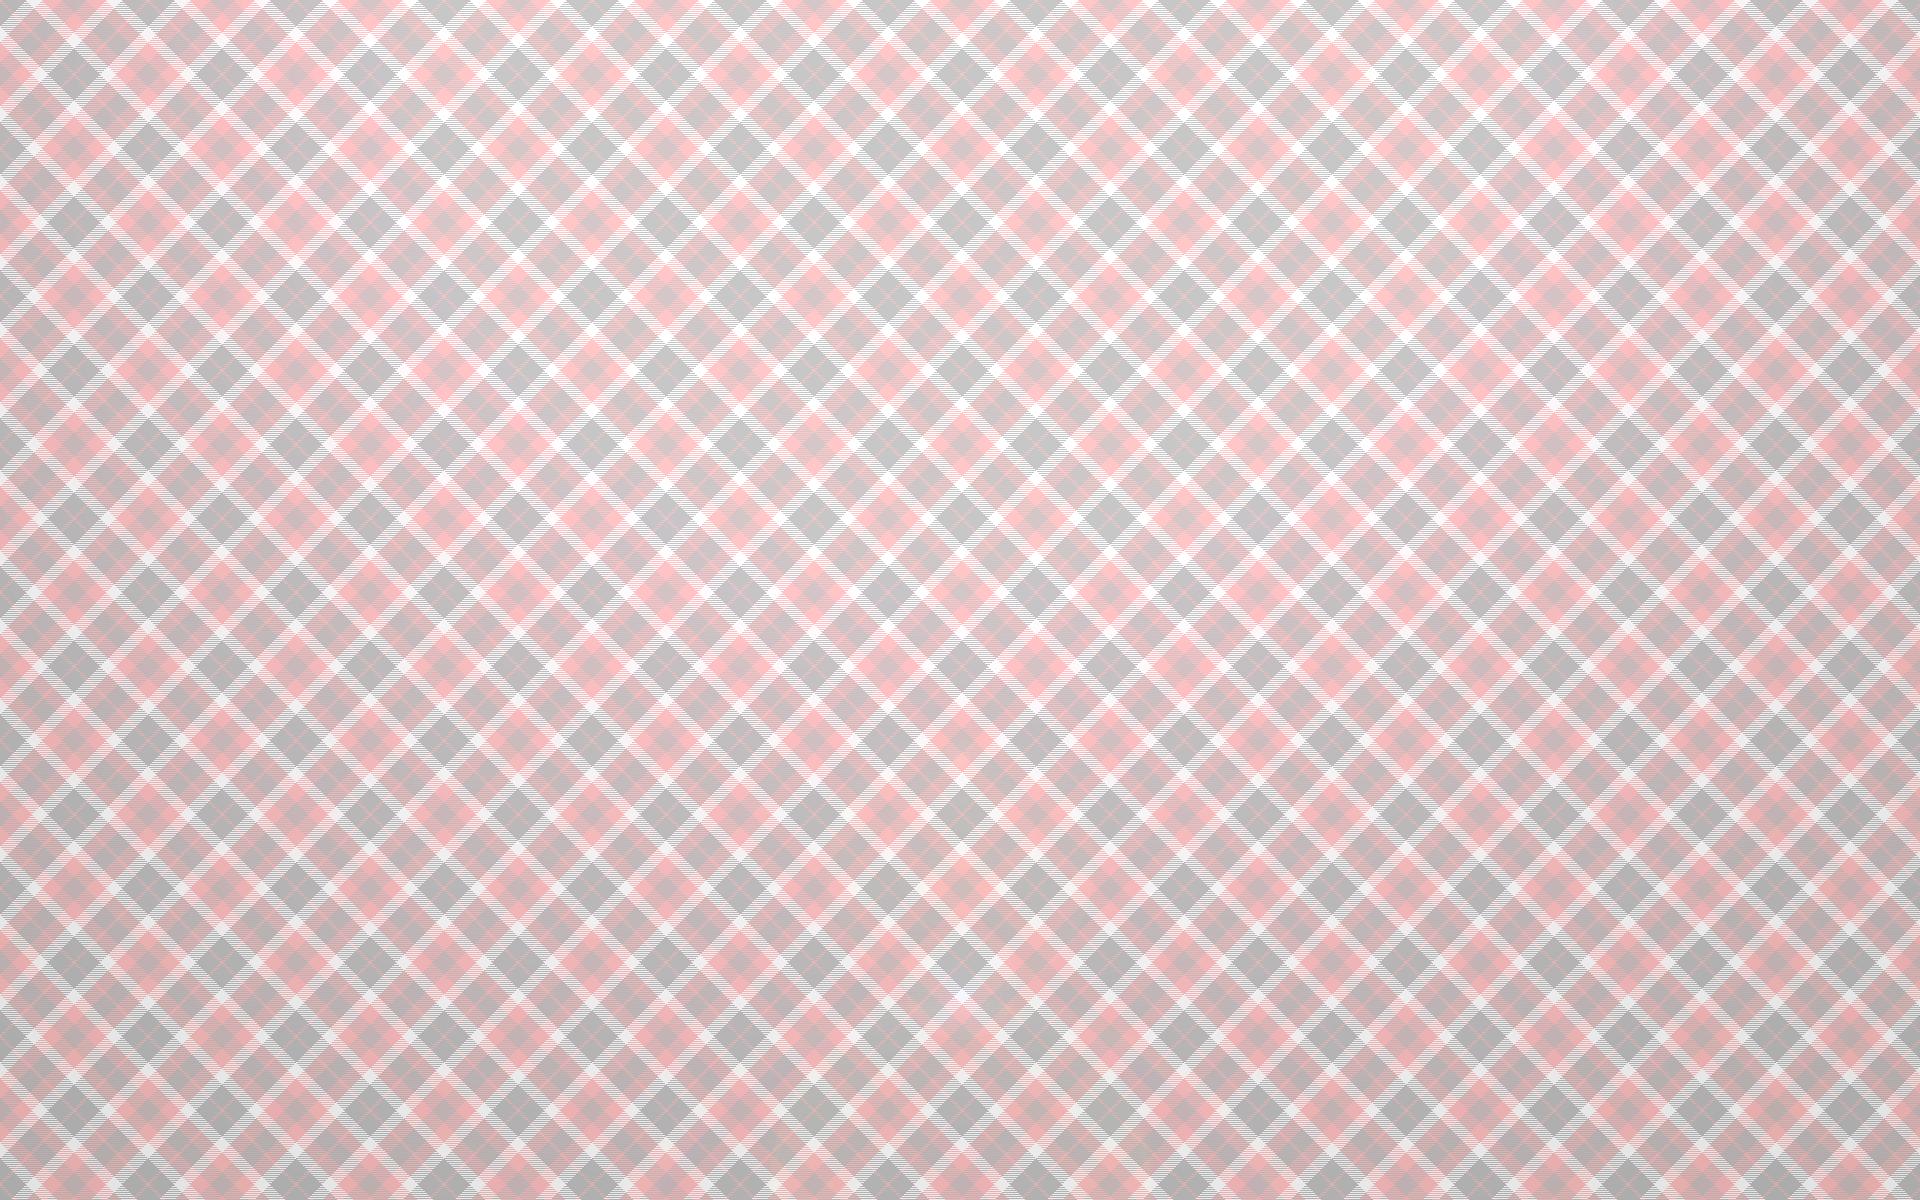 Pattern Wallpaper PC Computer